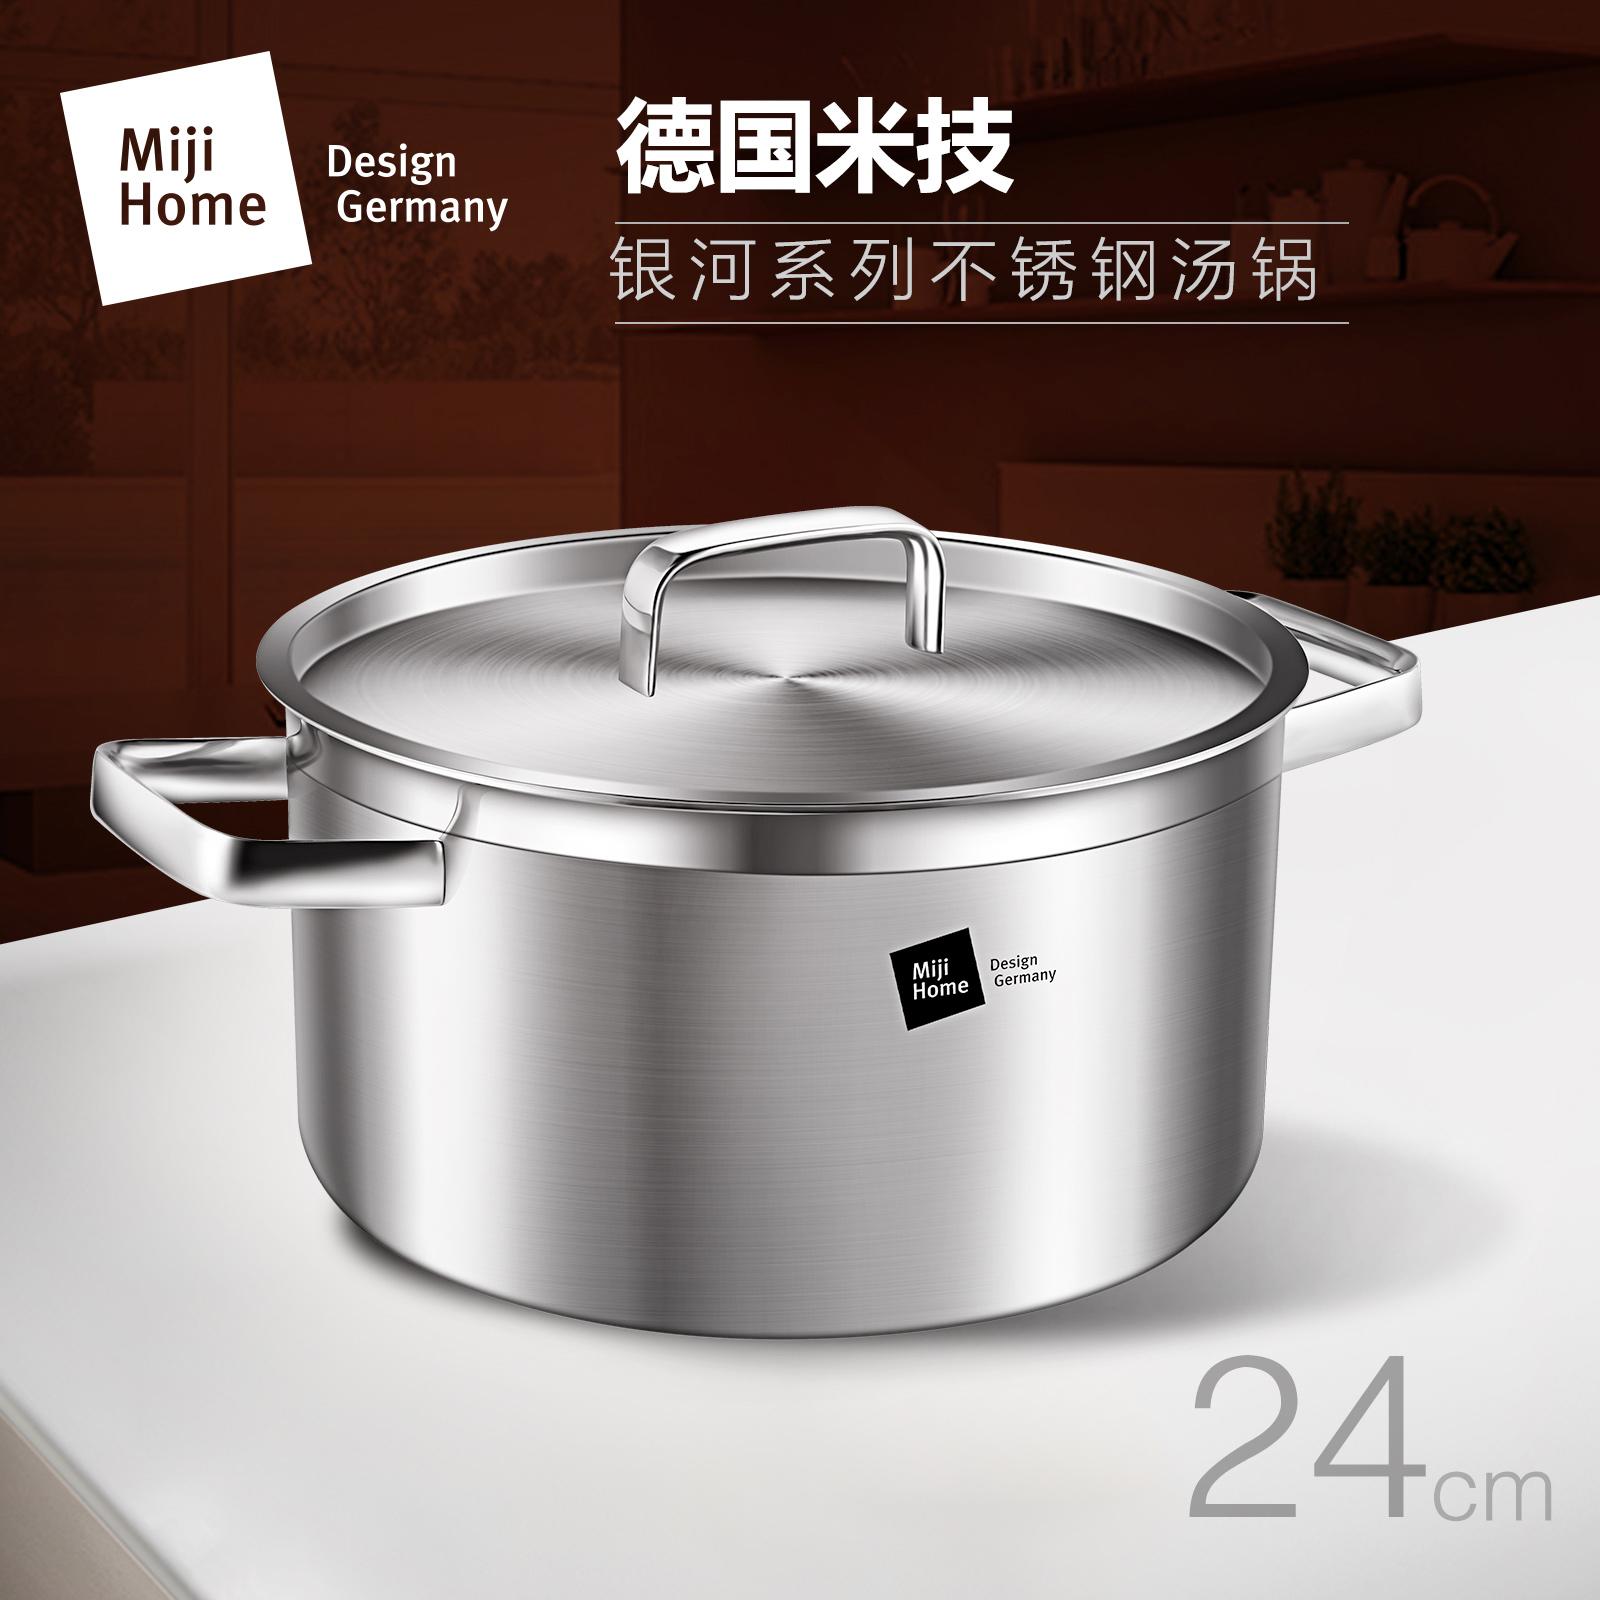 Miji 米技 银河系列 24CM双耳汤锅MH-SS24-A-CN